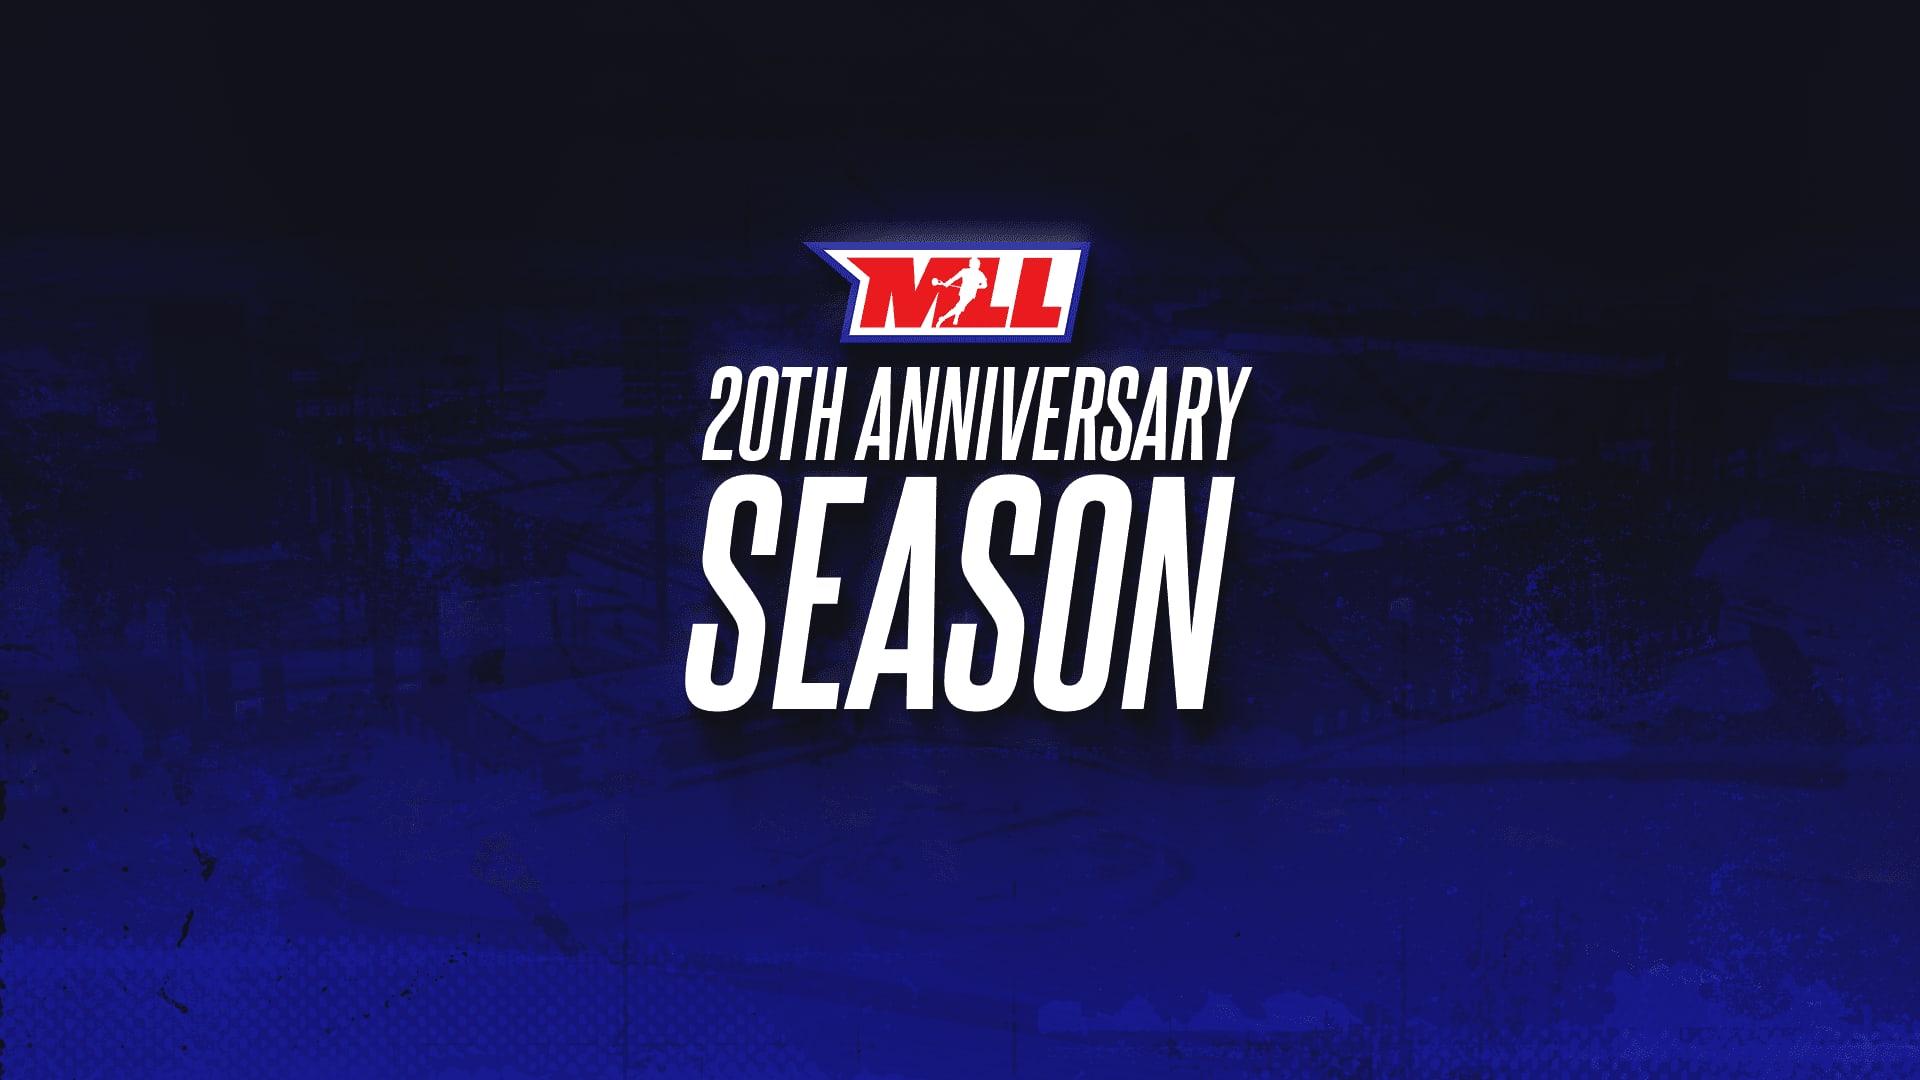 Annapolis to Host 2020 MLL Season July 18-26